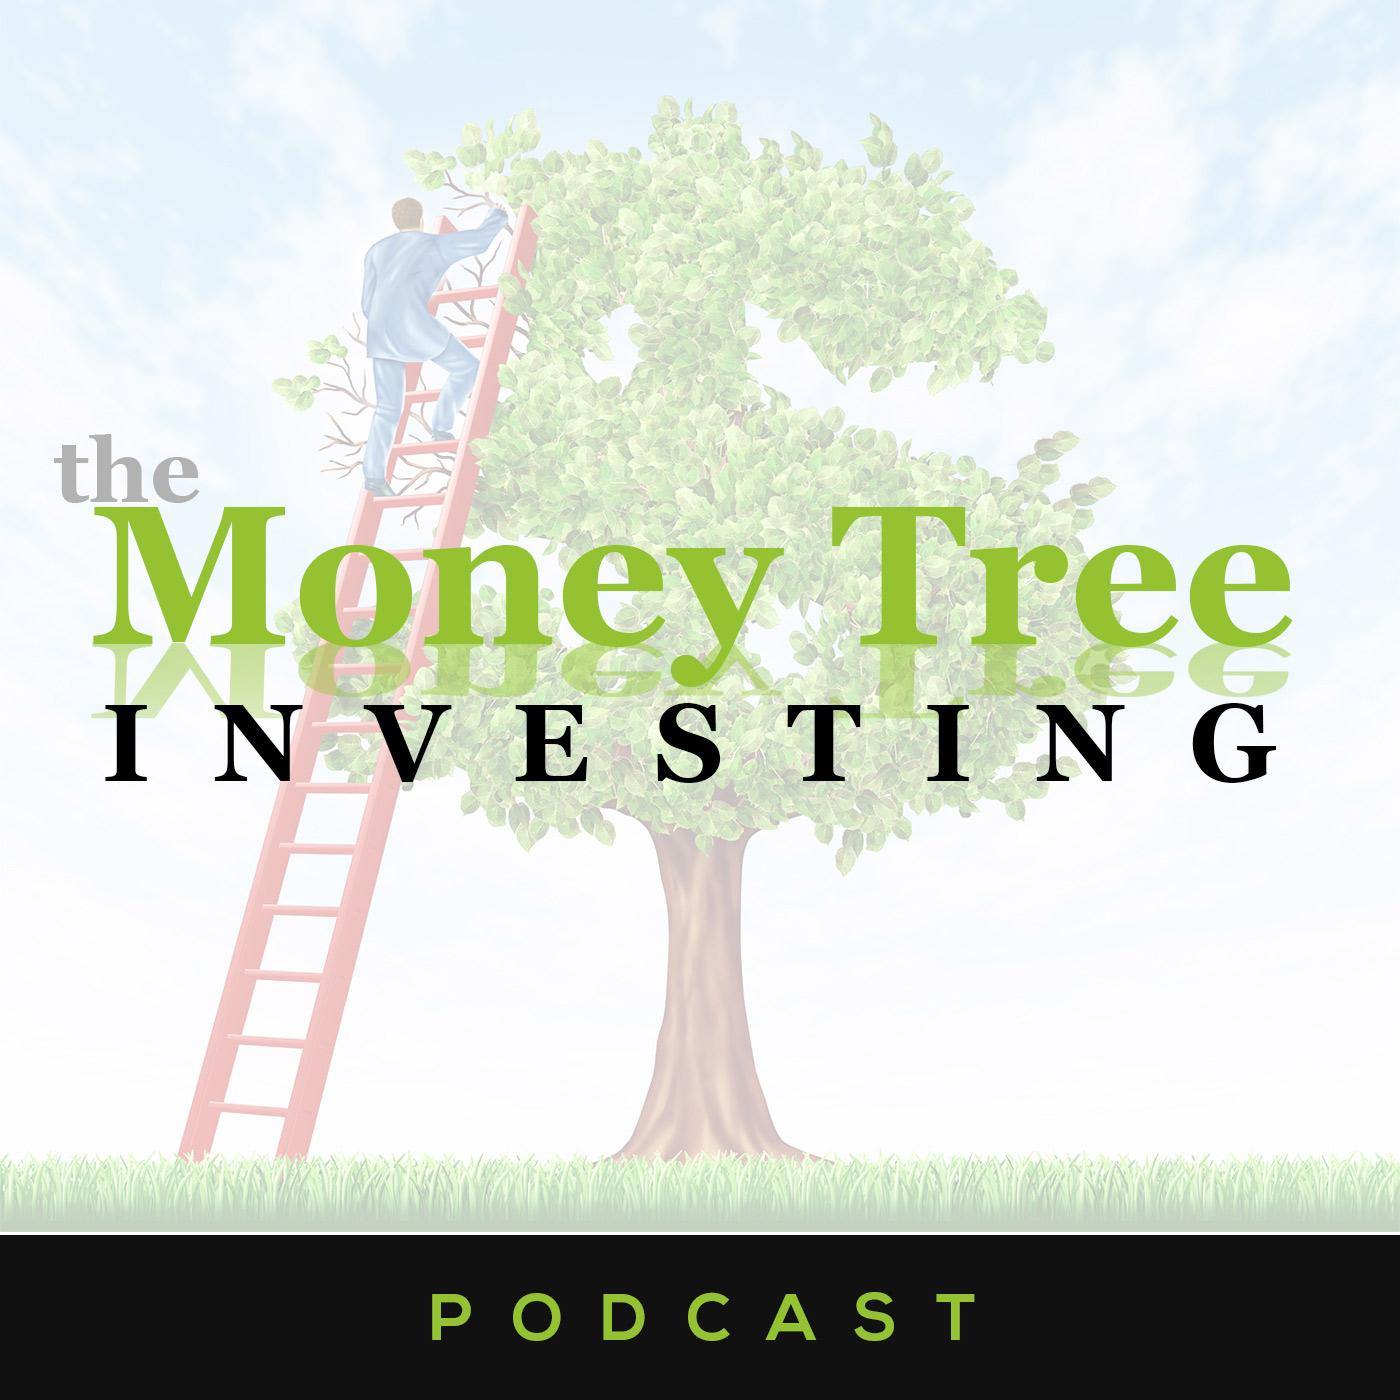 Money Tree Investing Podcast | Stock Market | Wealth | Personal Finance | Value Stocks  logo